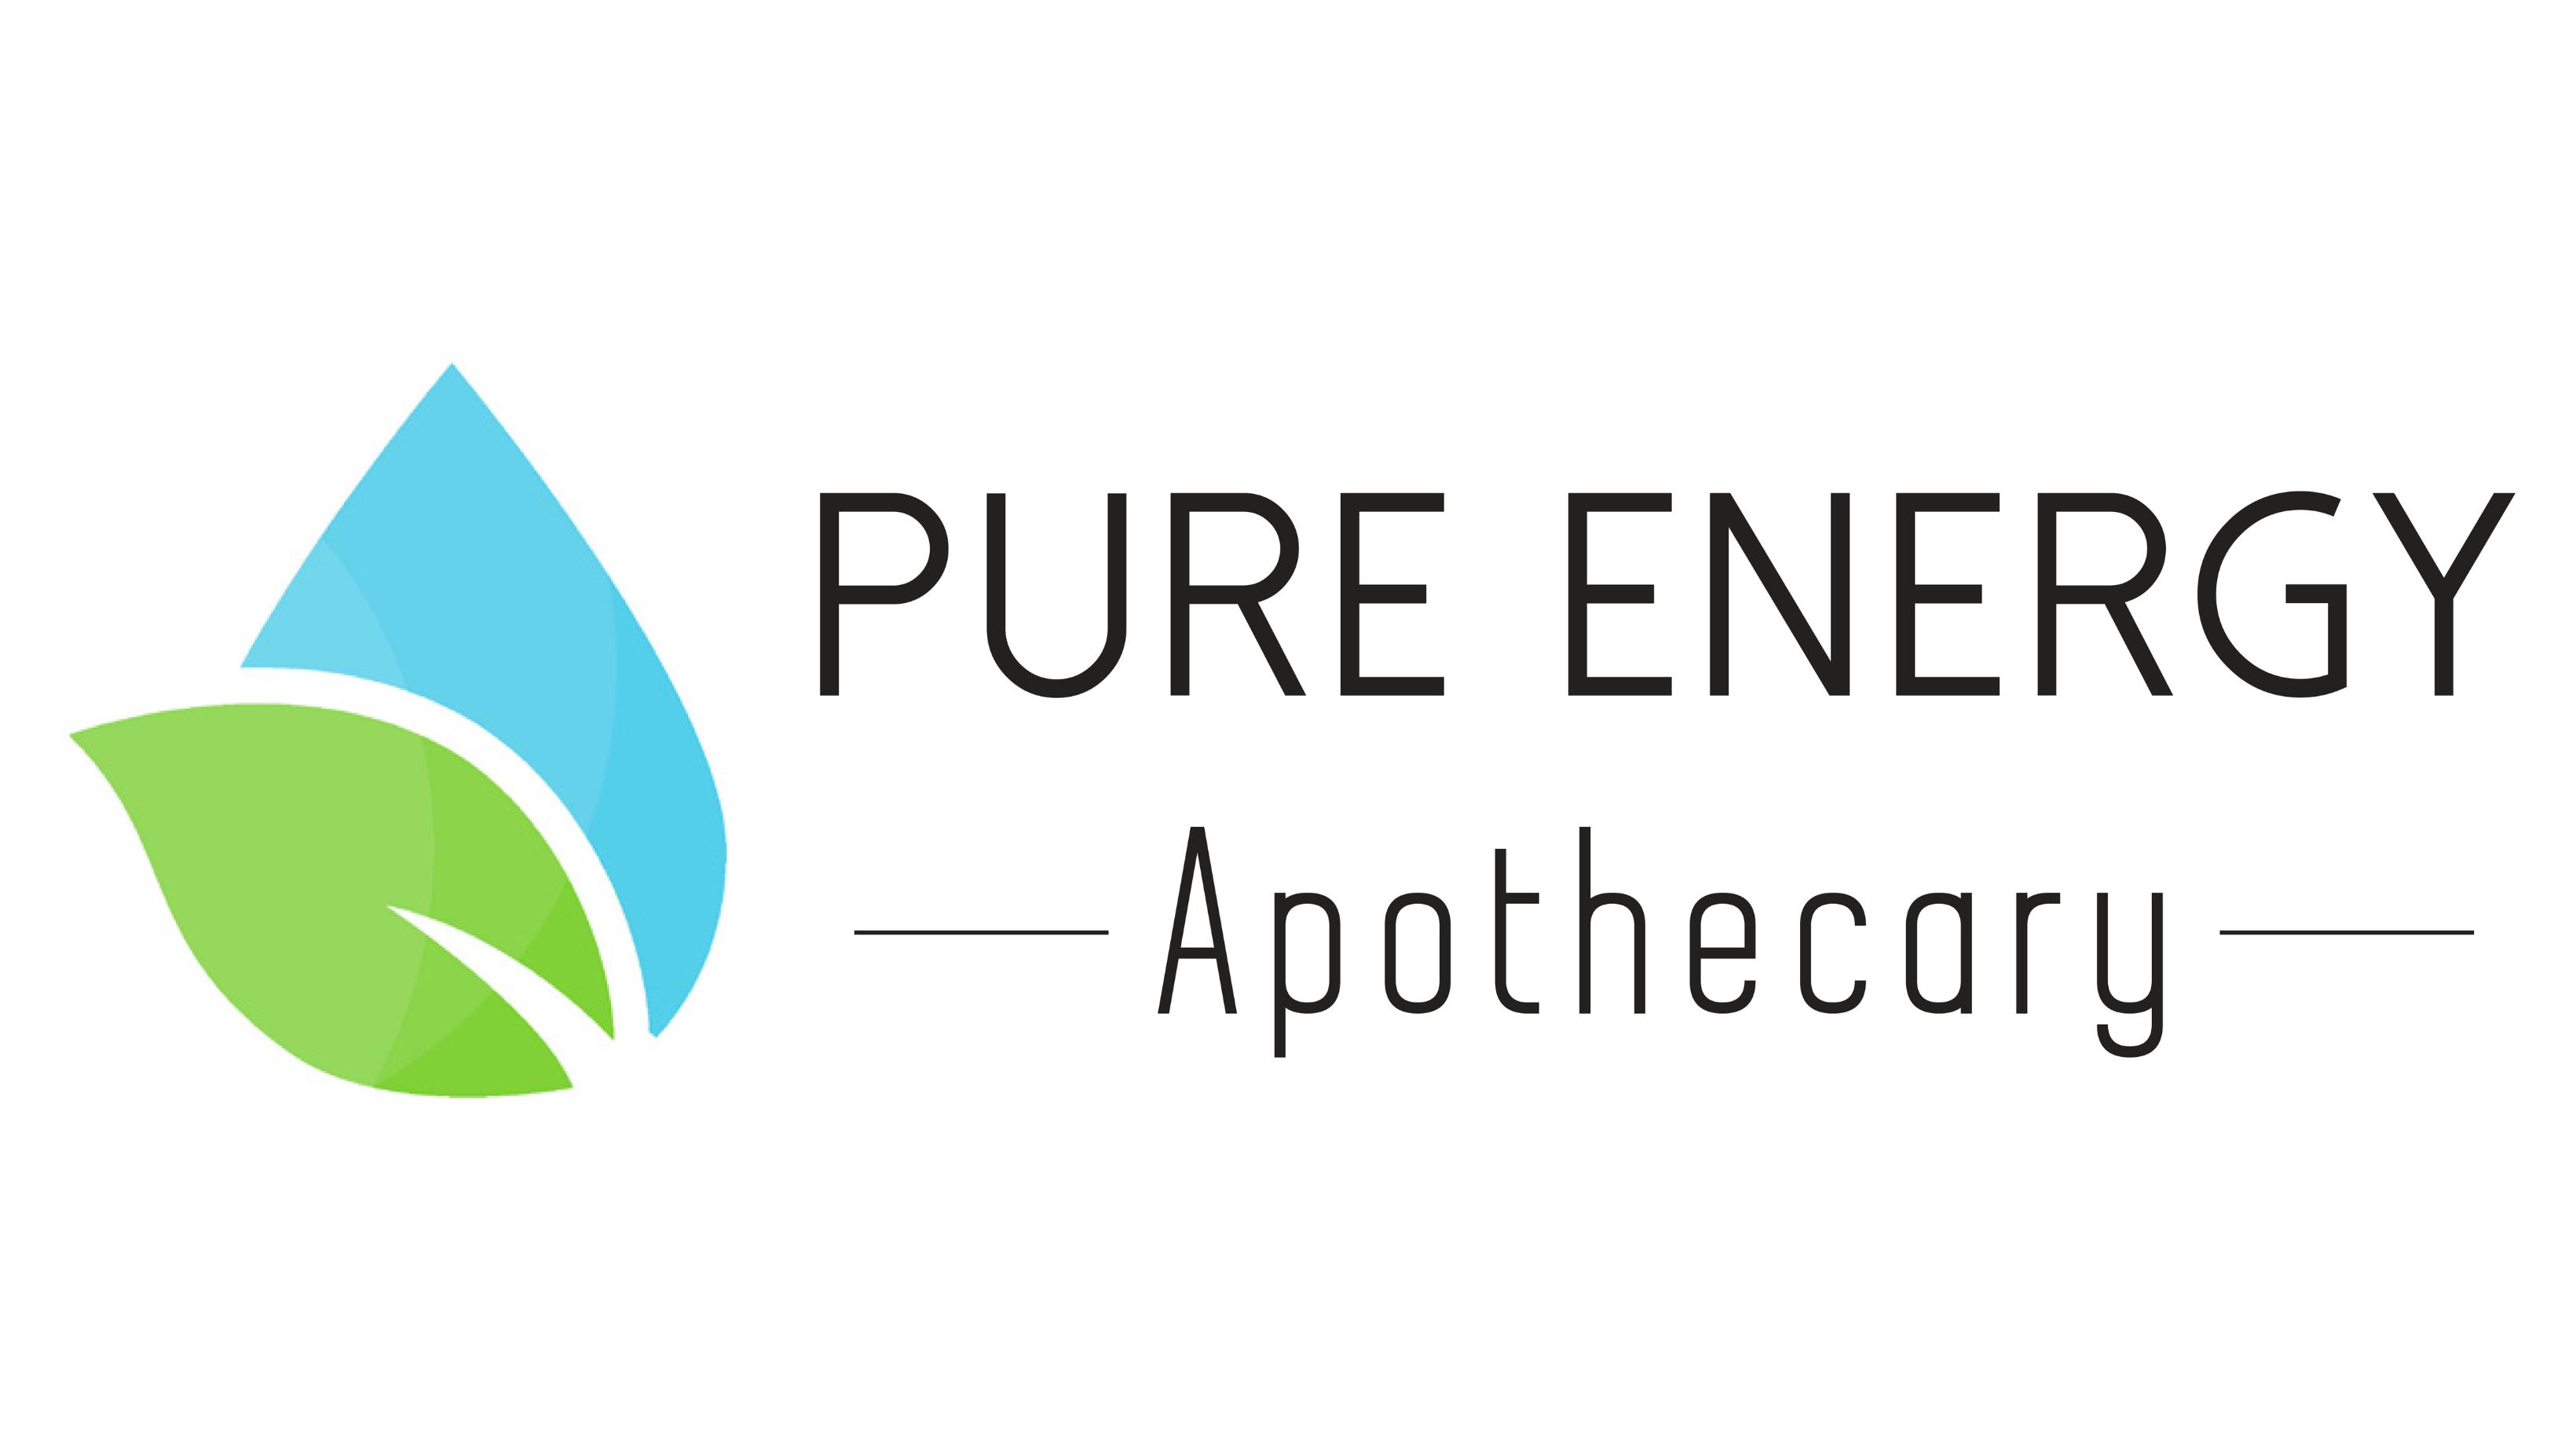 Pure Energy Apothecary Logo